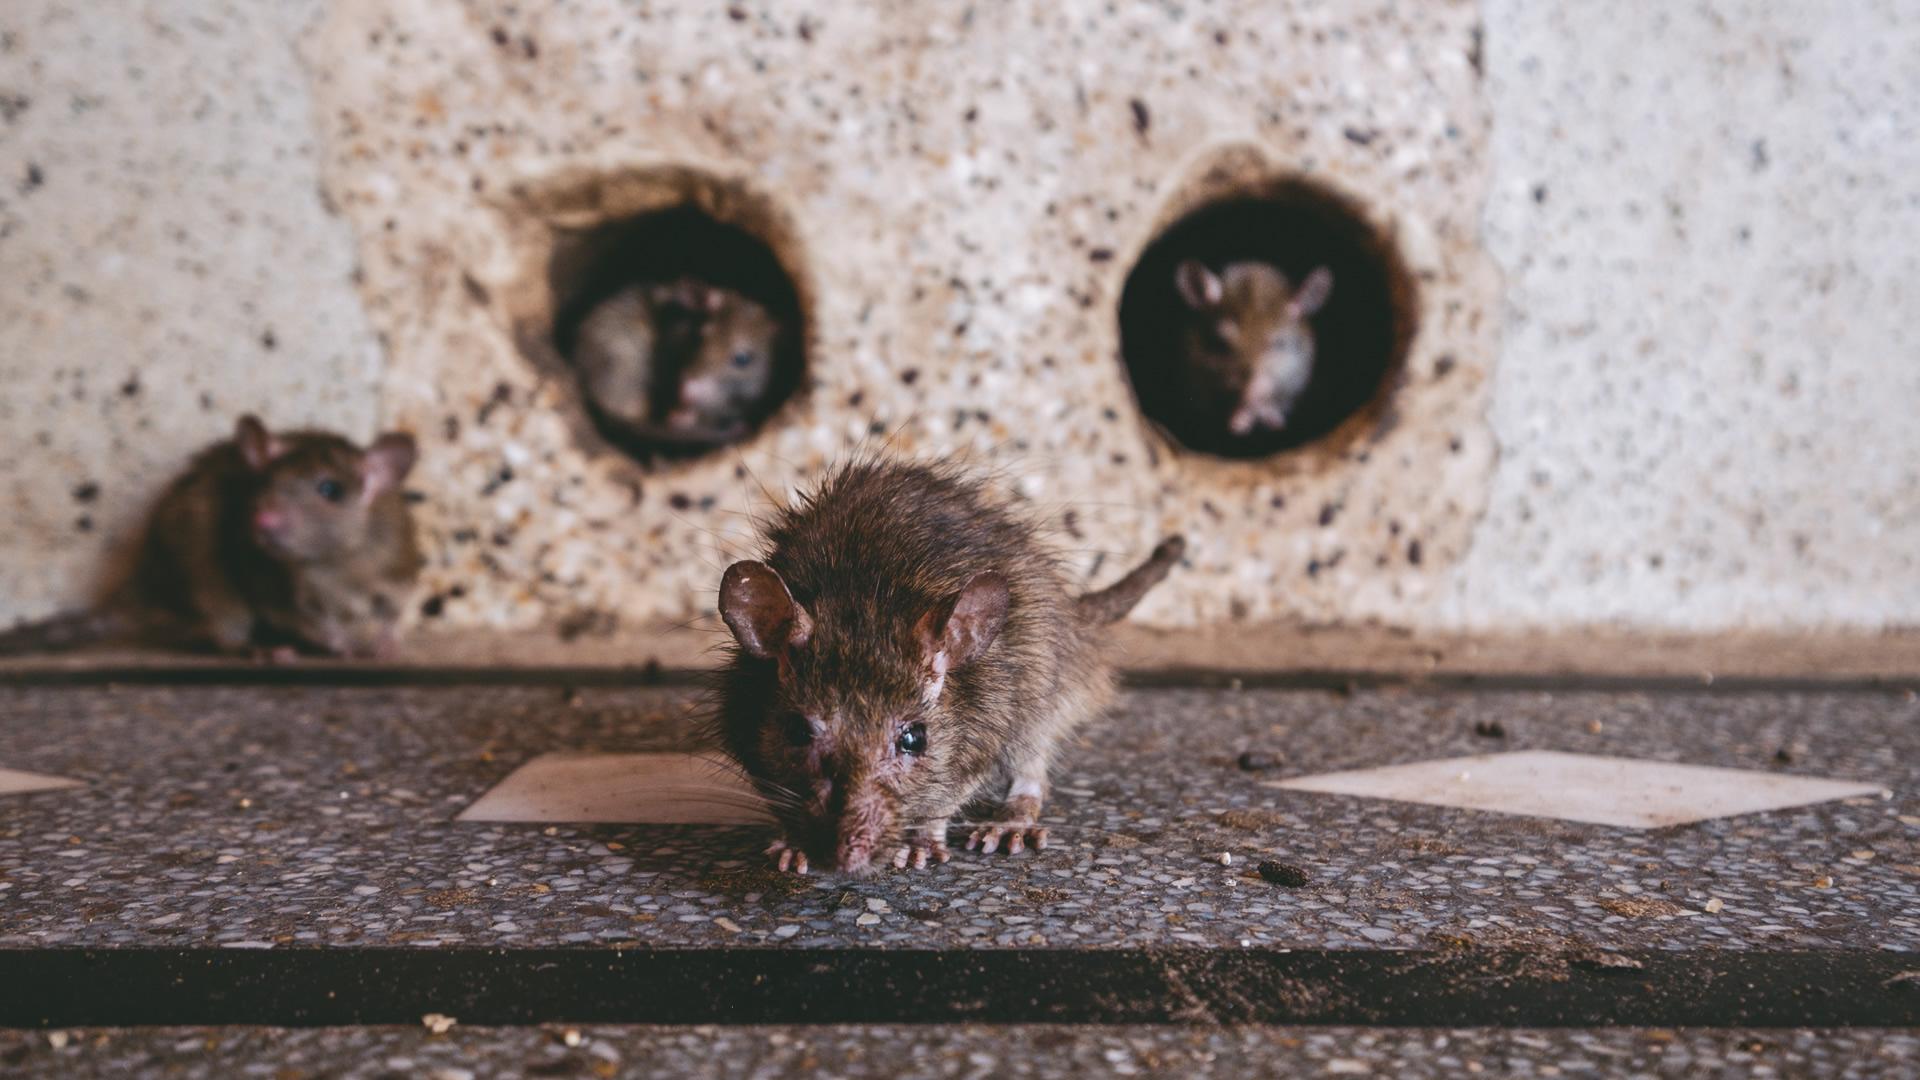 Black Rat, Karni Mata, Rat Temple, Rajasthan, India, Nathan Brayshaw travel photographer